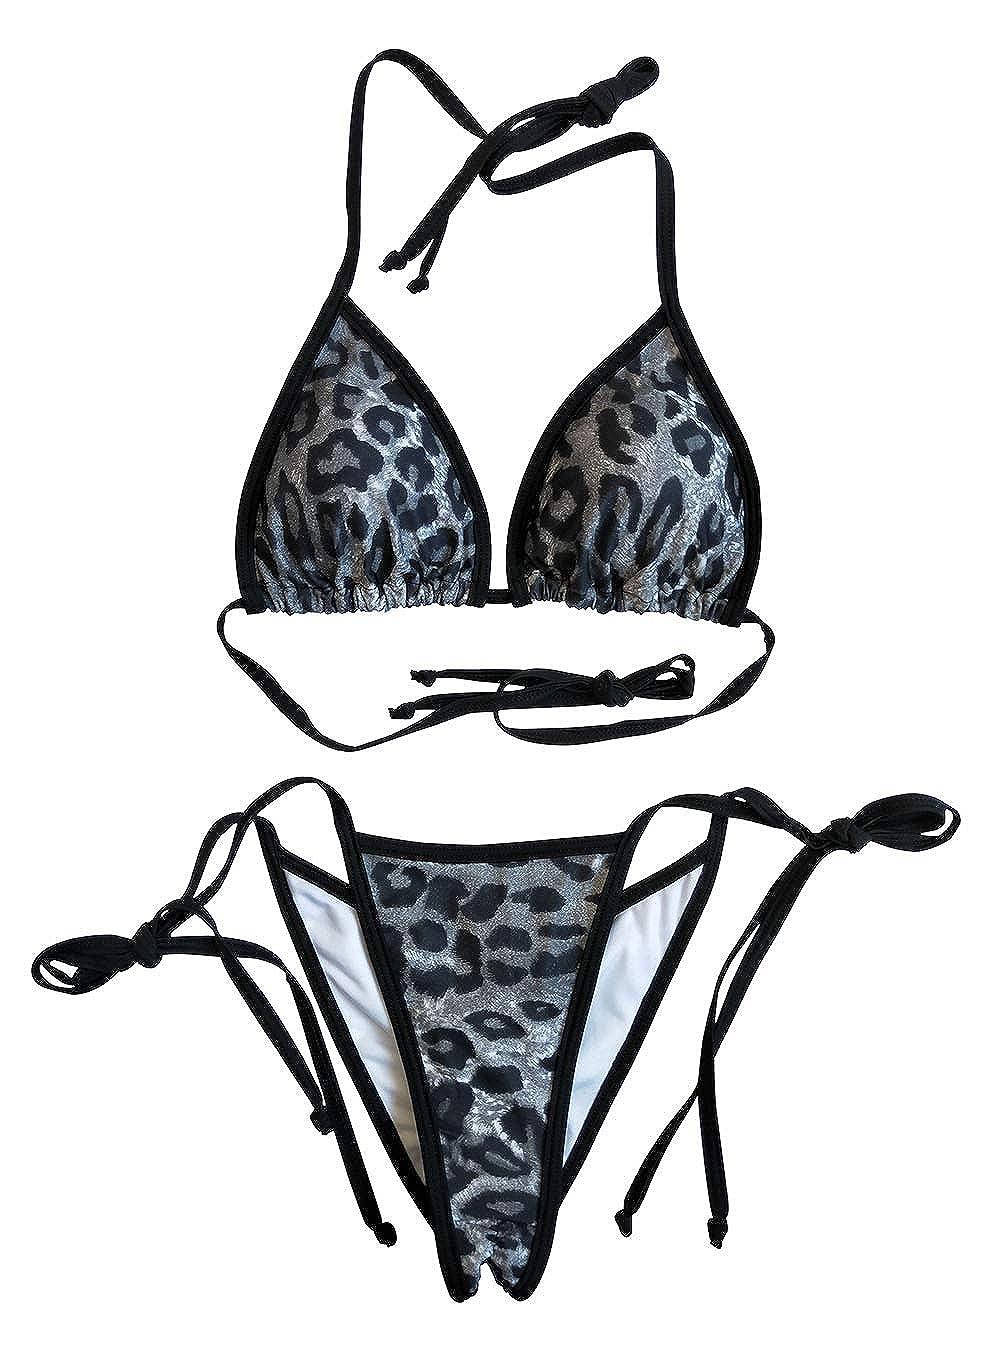 LE BESI Womens Mini Fashion Elegant Inspired Swimsuit Bikini Top Bottom /…